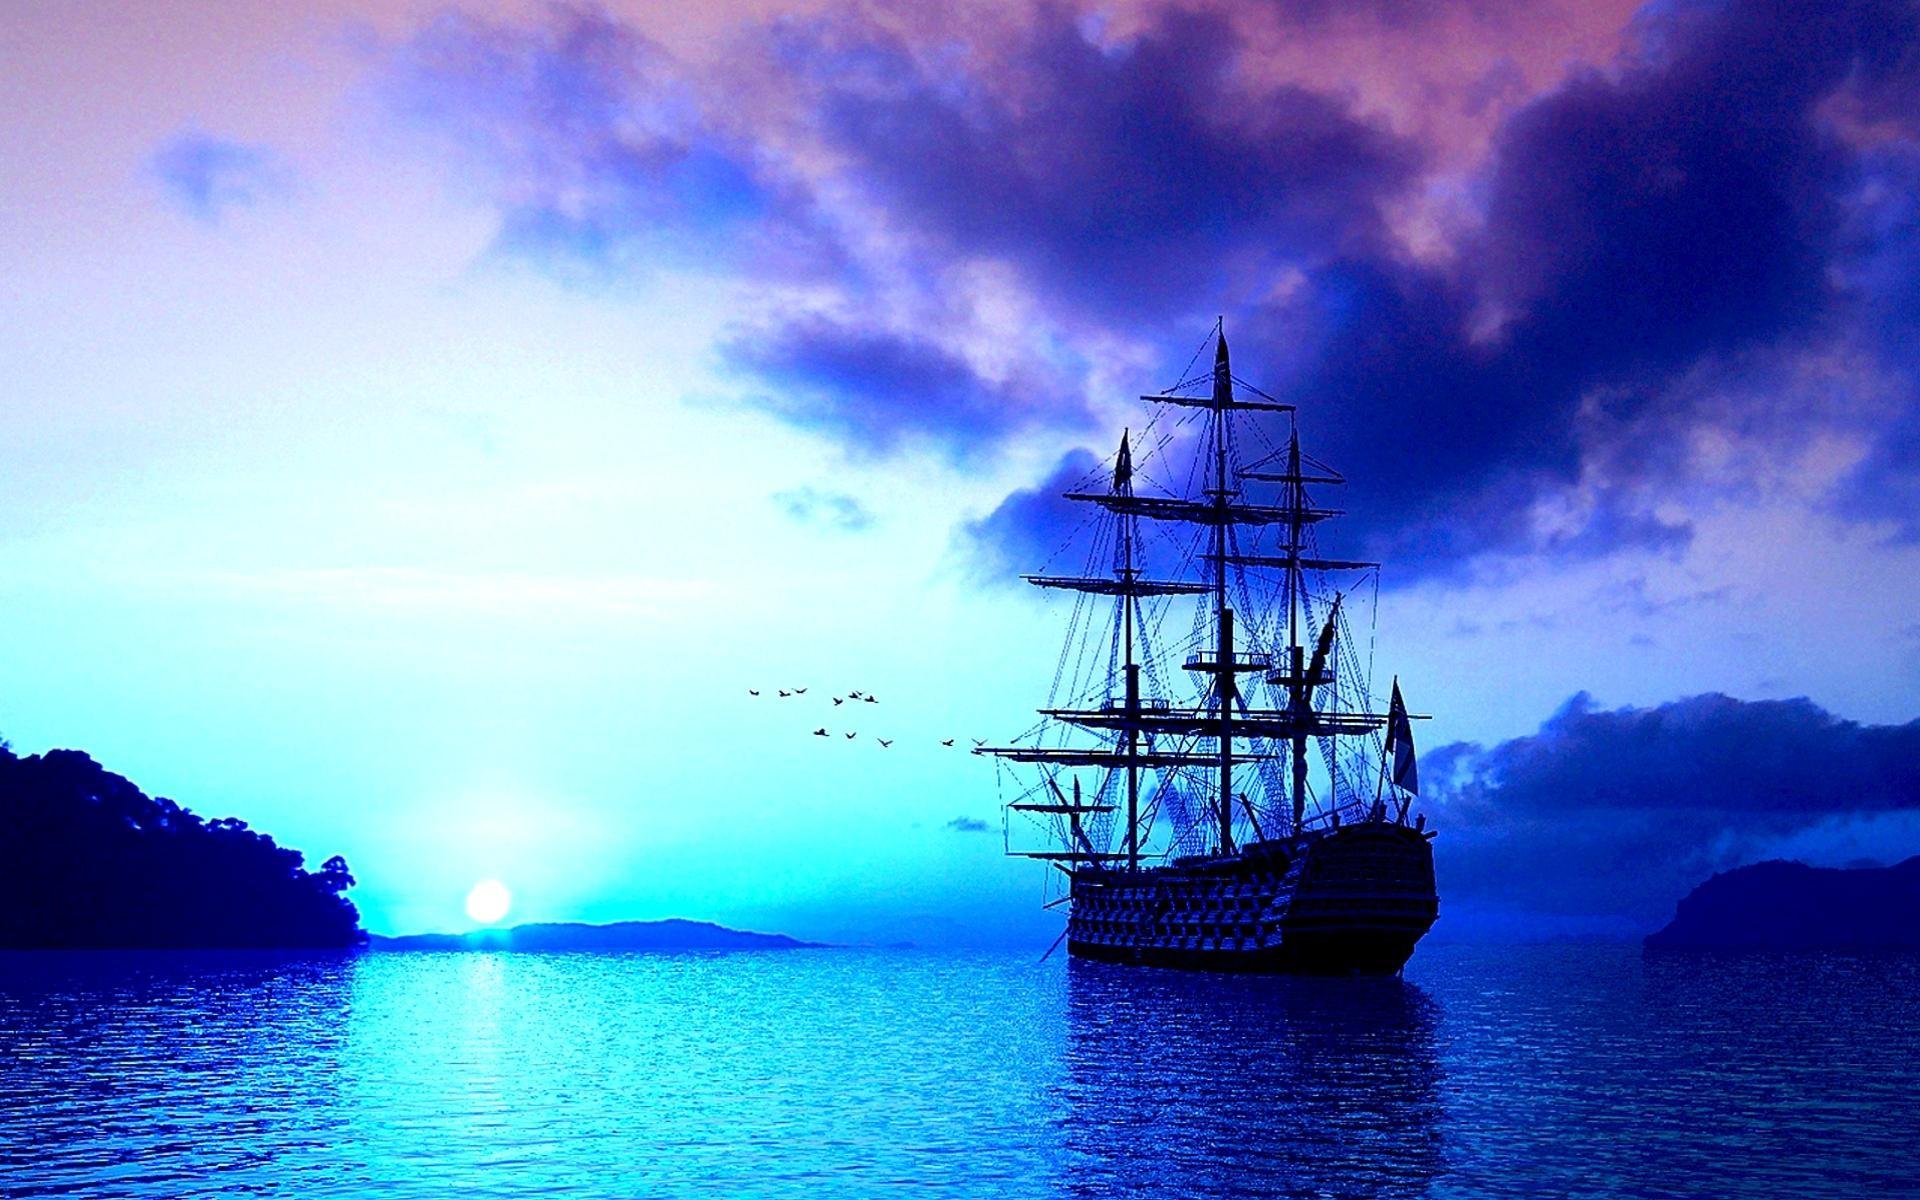 картинка корабль на телефон обои лука ветвистого